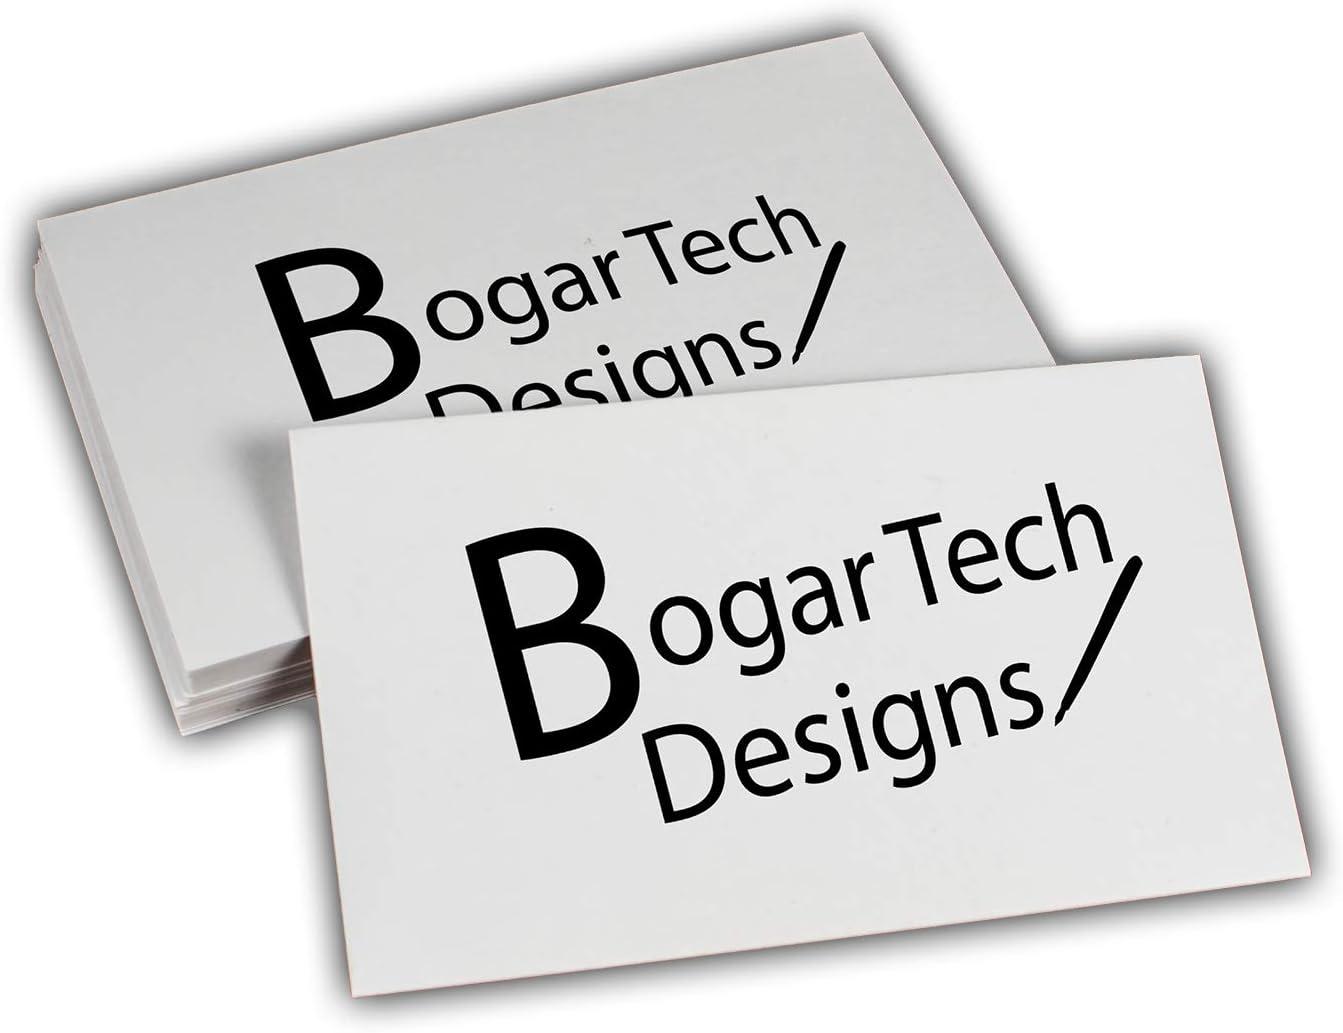 PRECUT Steering Wheel Emblem Overlay Vinyl Decal Sticker Compatible with Chevy Silverado 2014-2019 Gloss Black Bogar Tech Designs